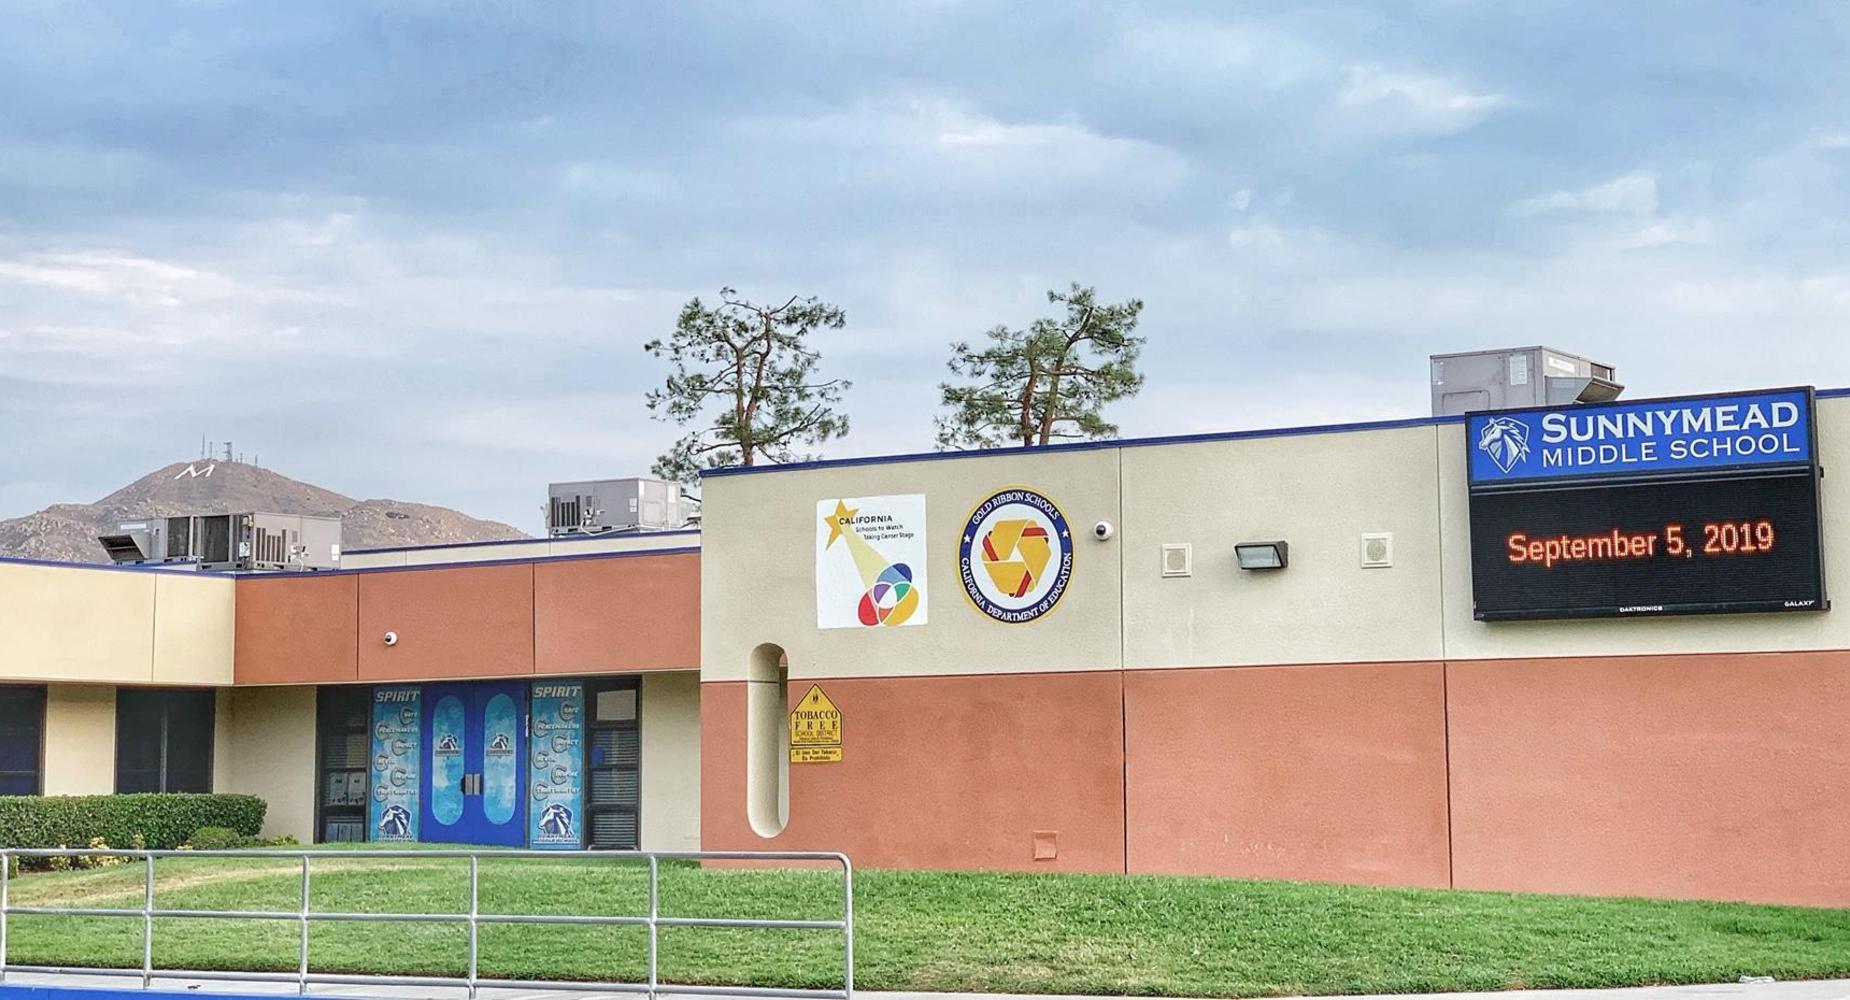 Sunnymead Middle School - promo codes roblox high school 2 staff